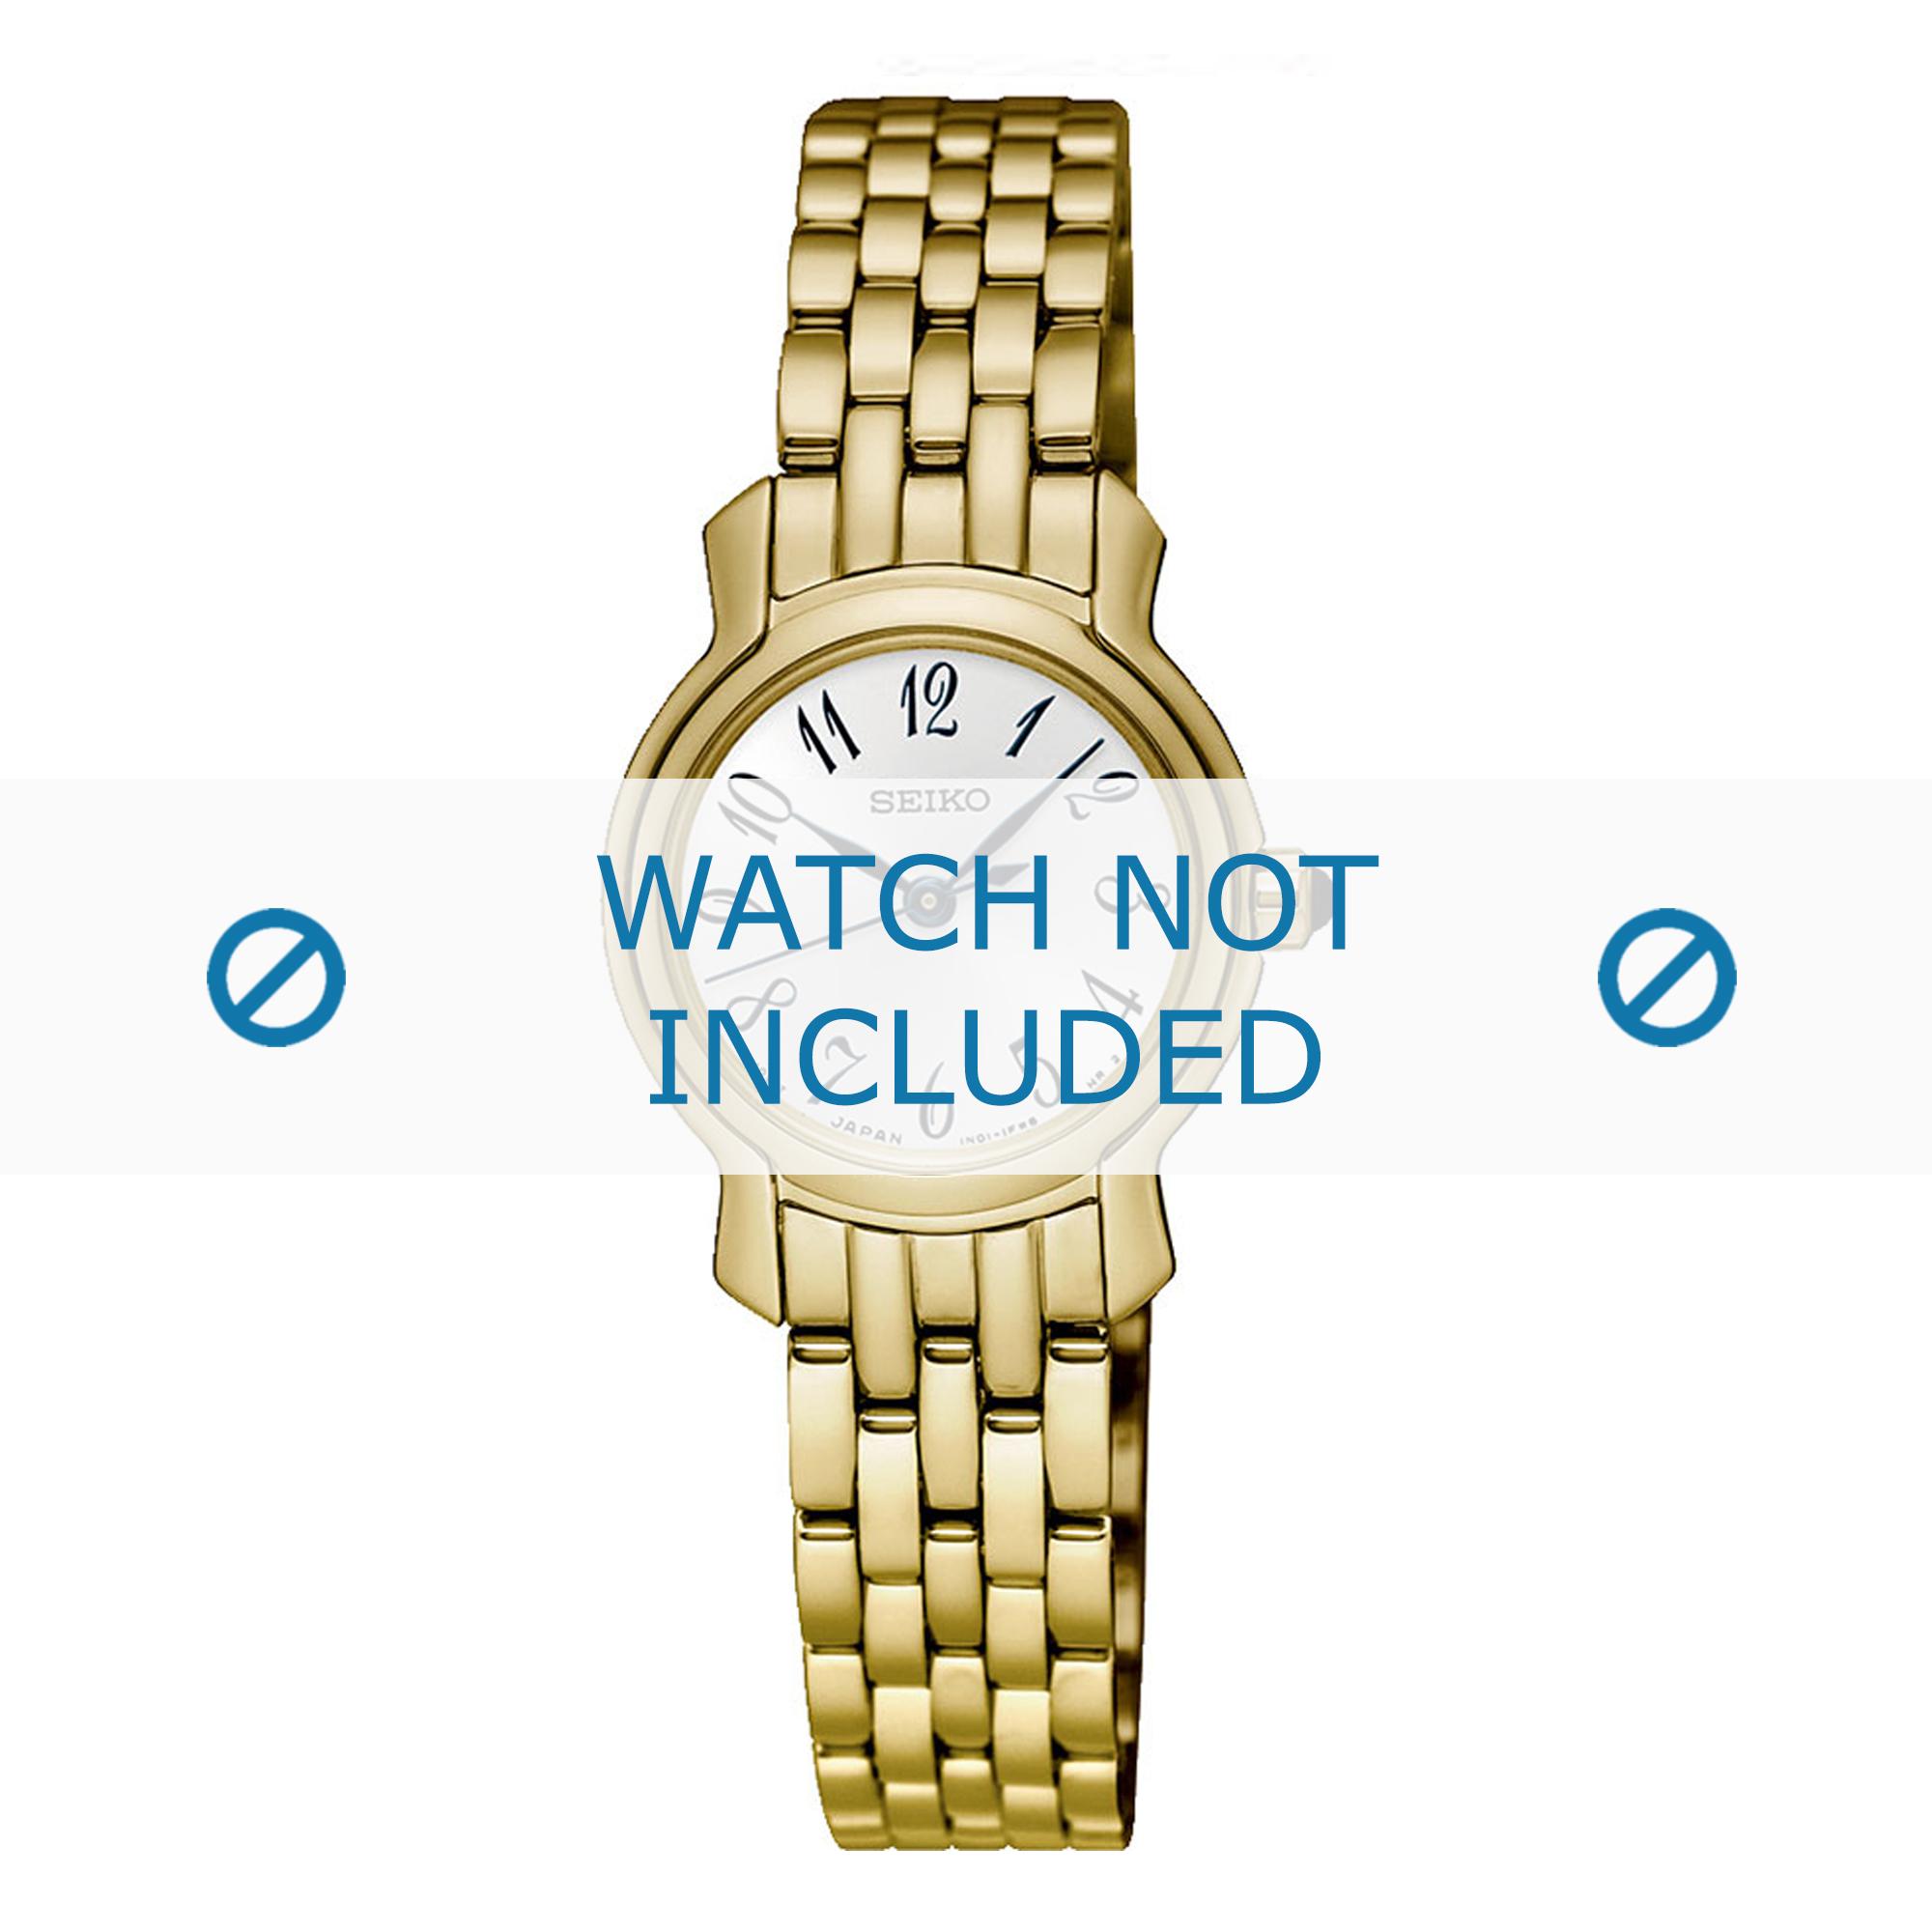 Seiko horlogeband SXGP64P1 / 1N01 0SG0 Staal Goud 11mm